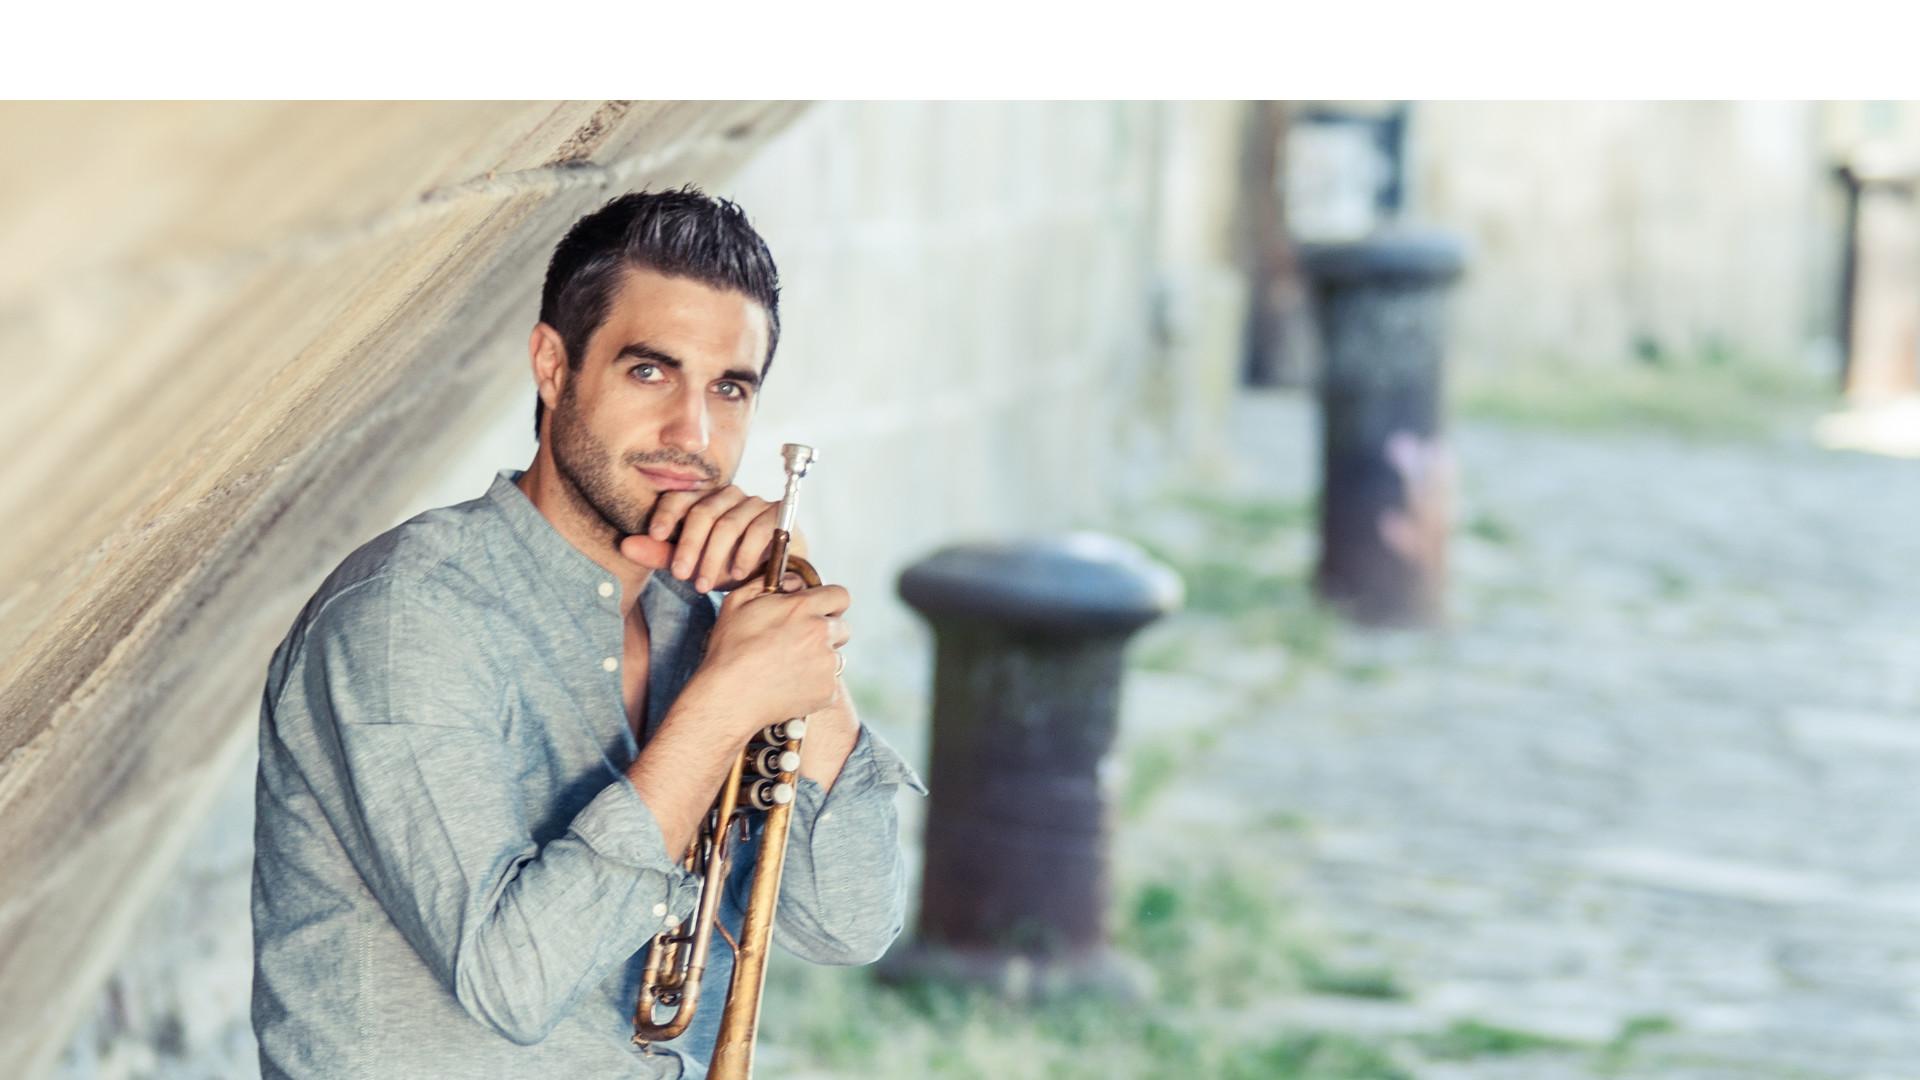 Dominik Glöbl - Trompeter, Moderator und Komponist